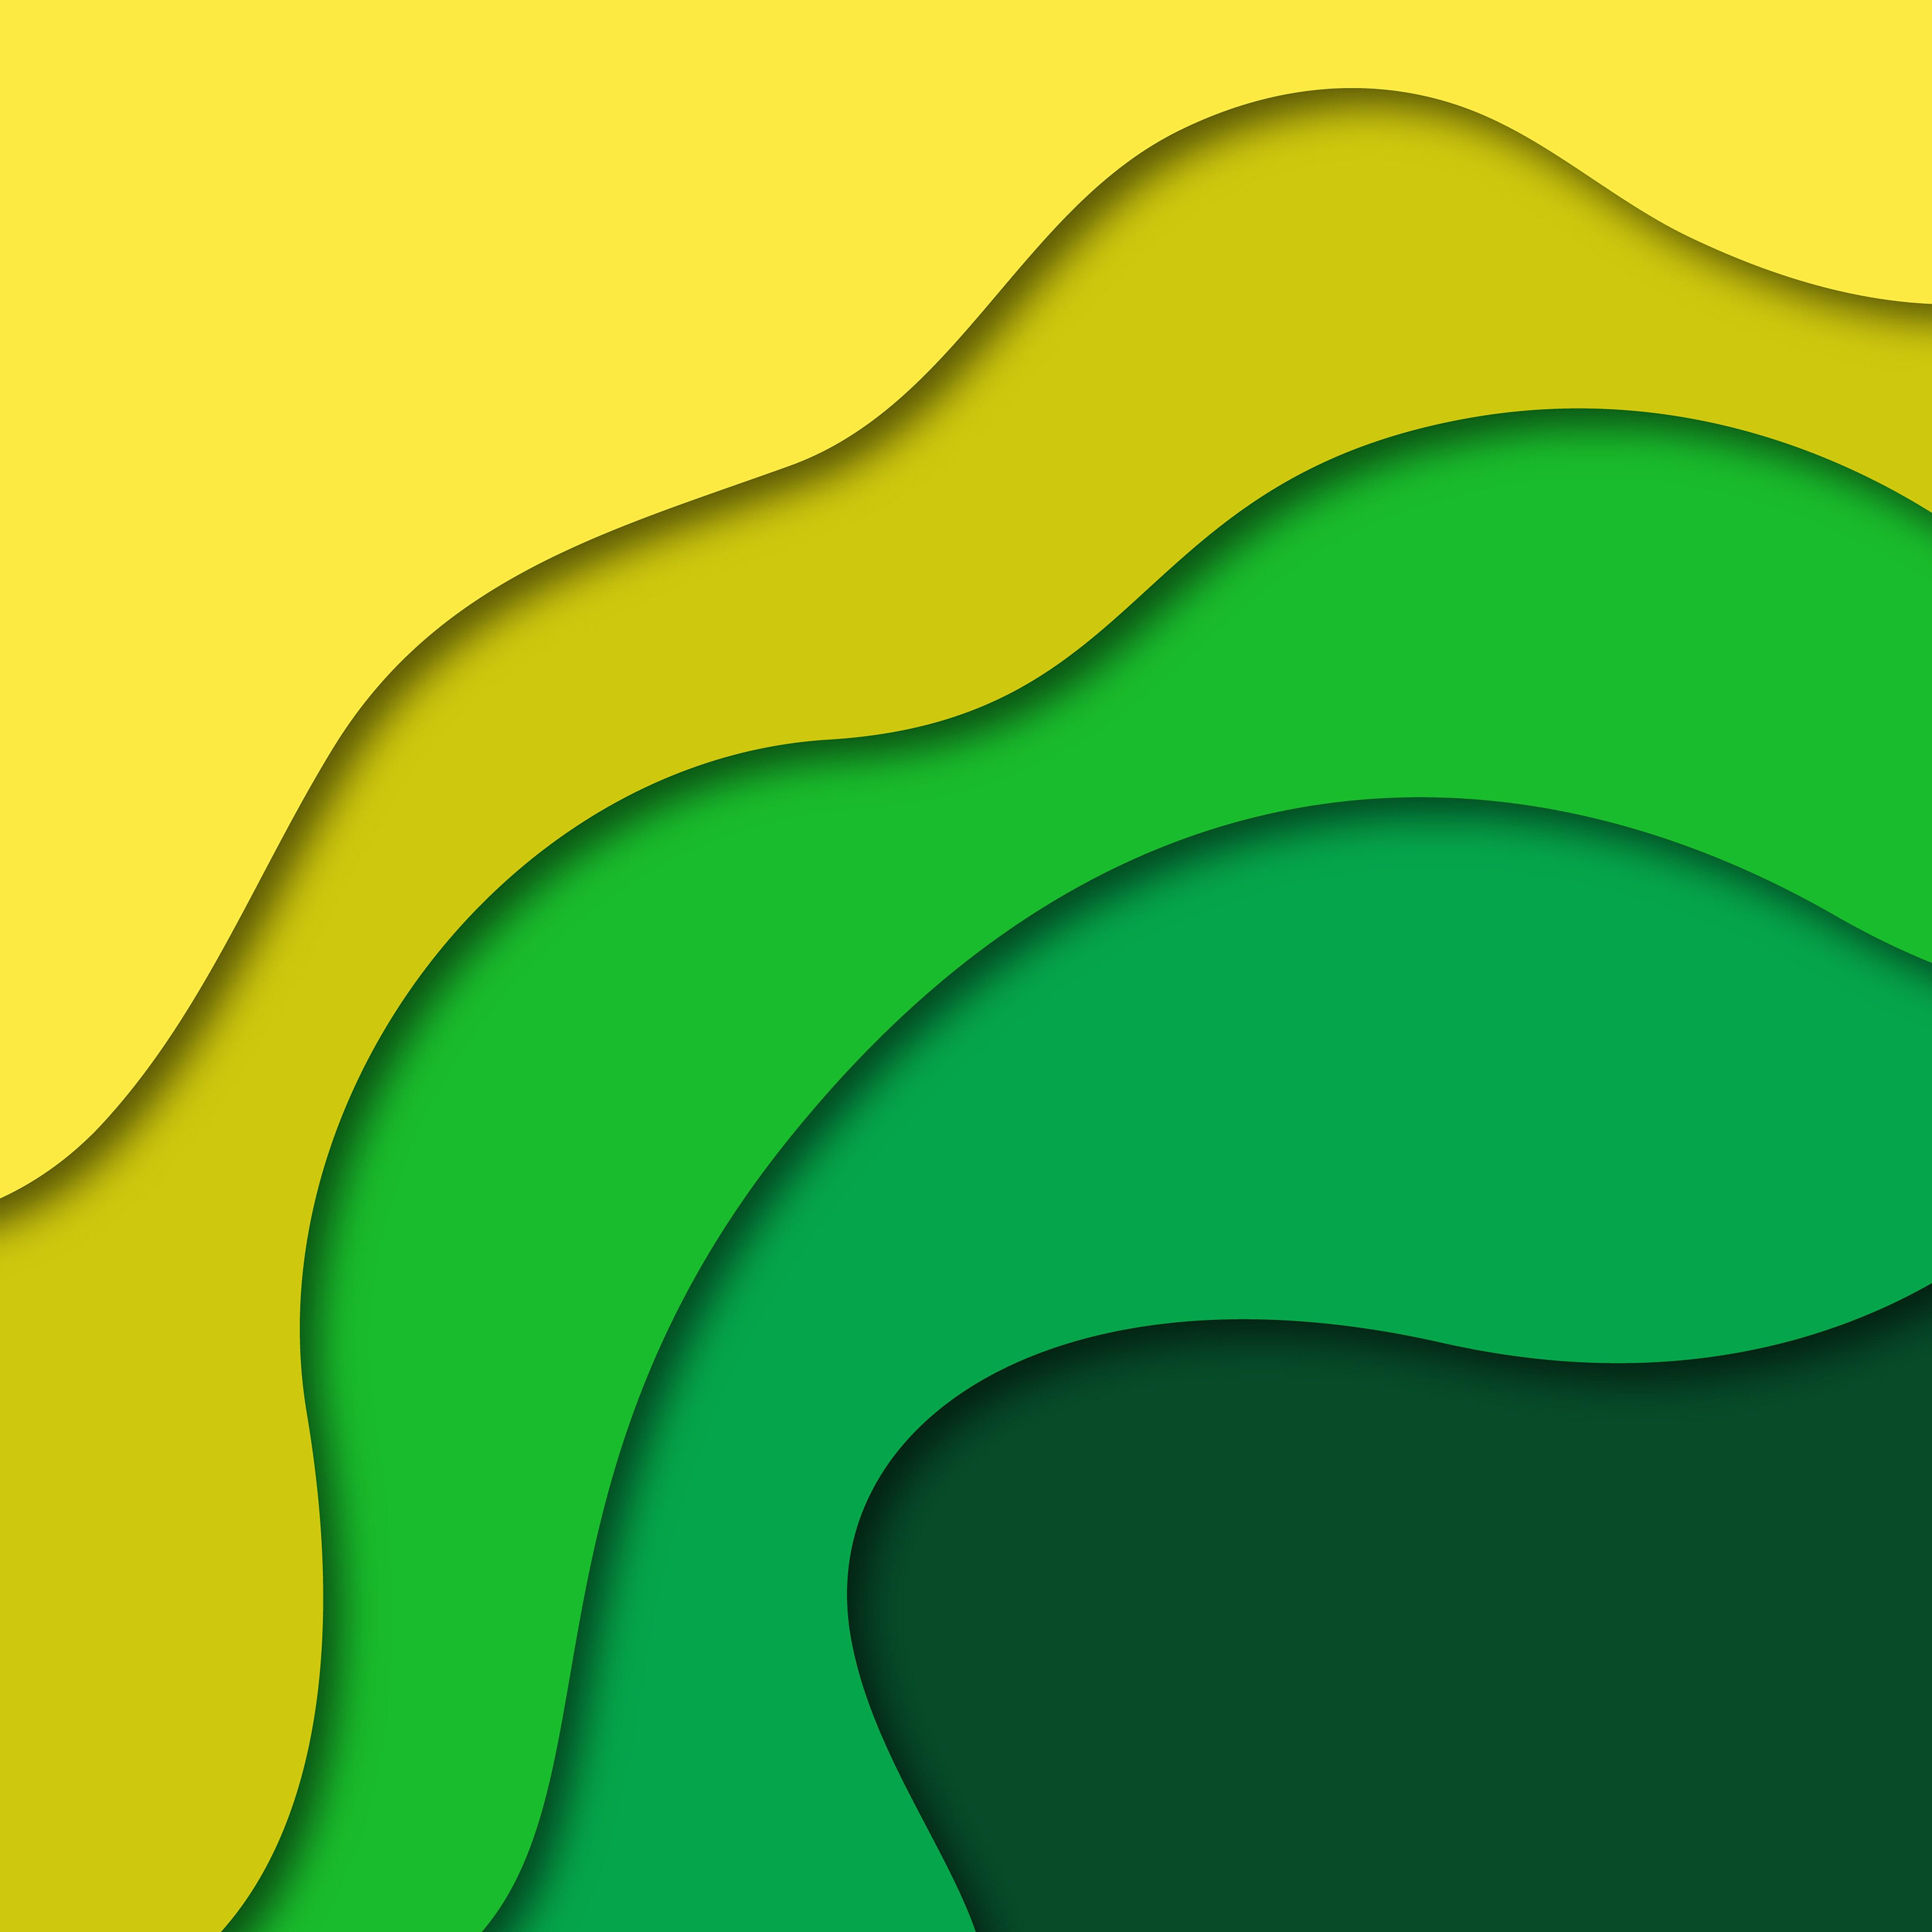 Wallpaper : Texture, Abstract 5000x5000